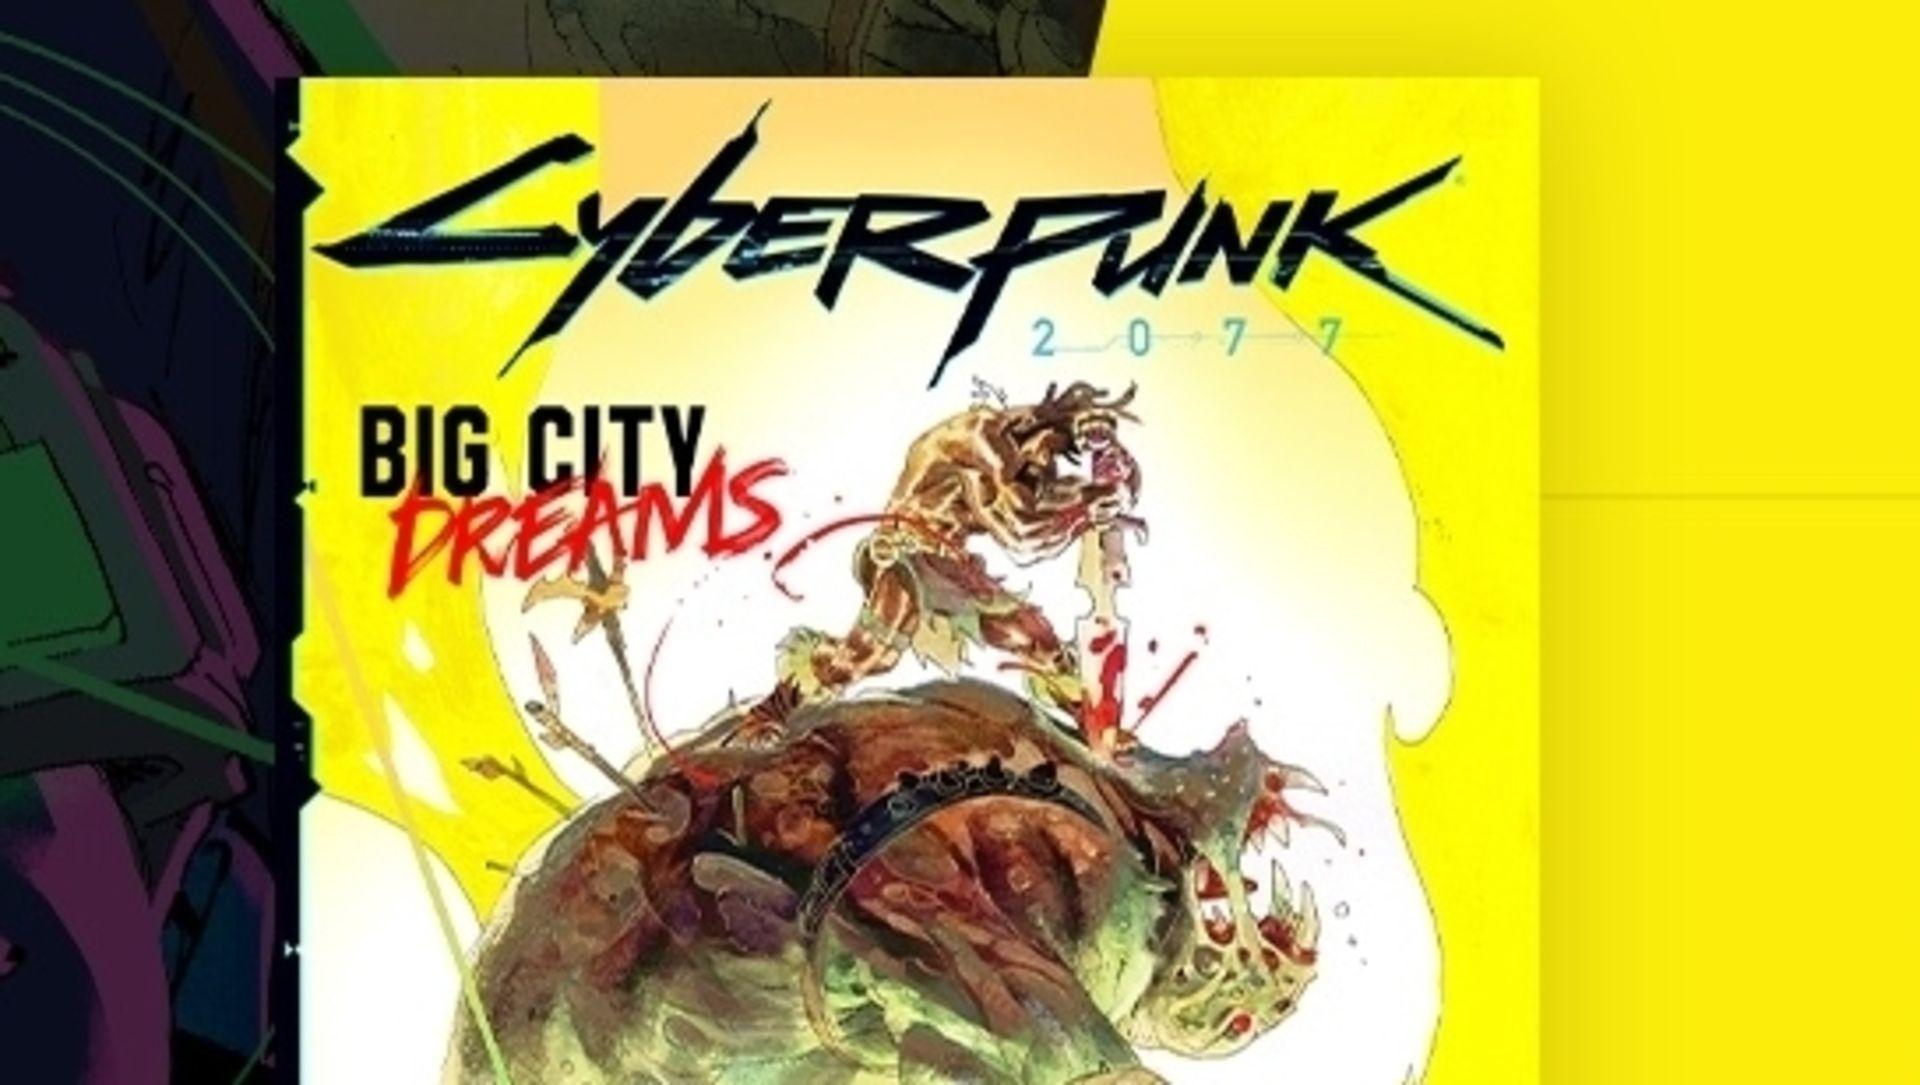 Cyberpunk 2077 digital comic